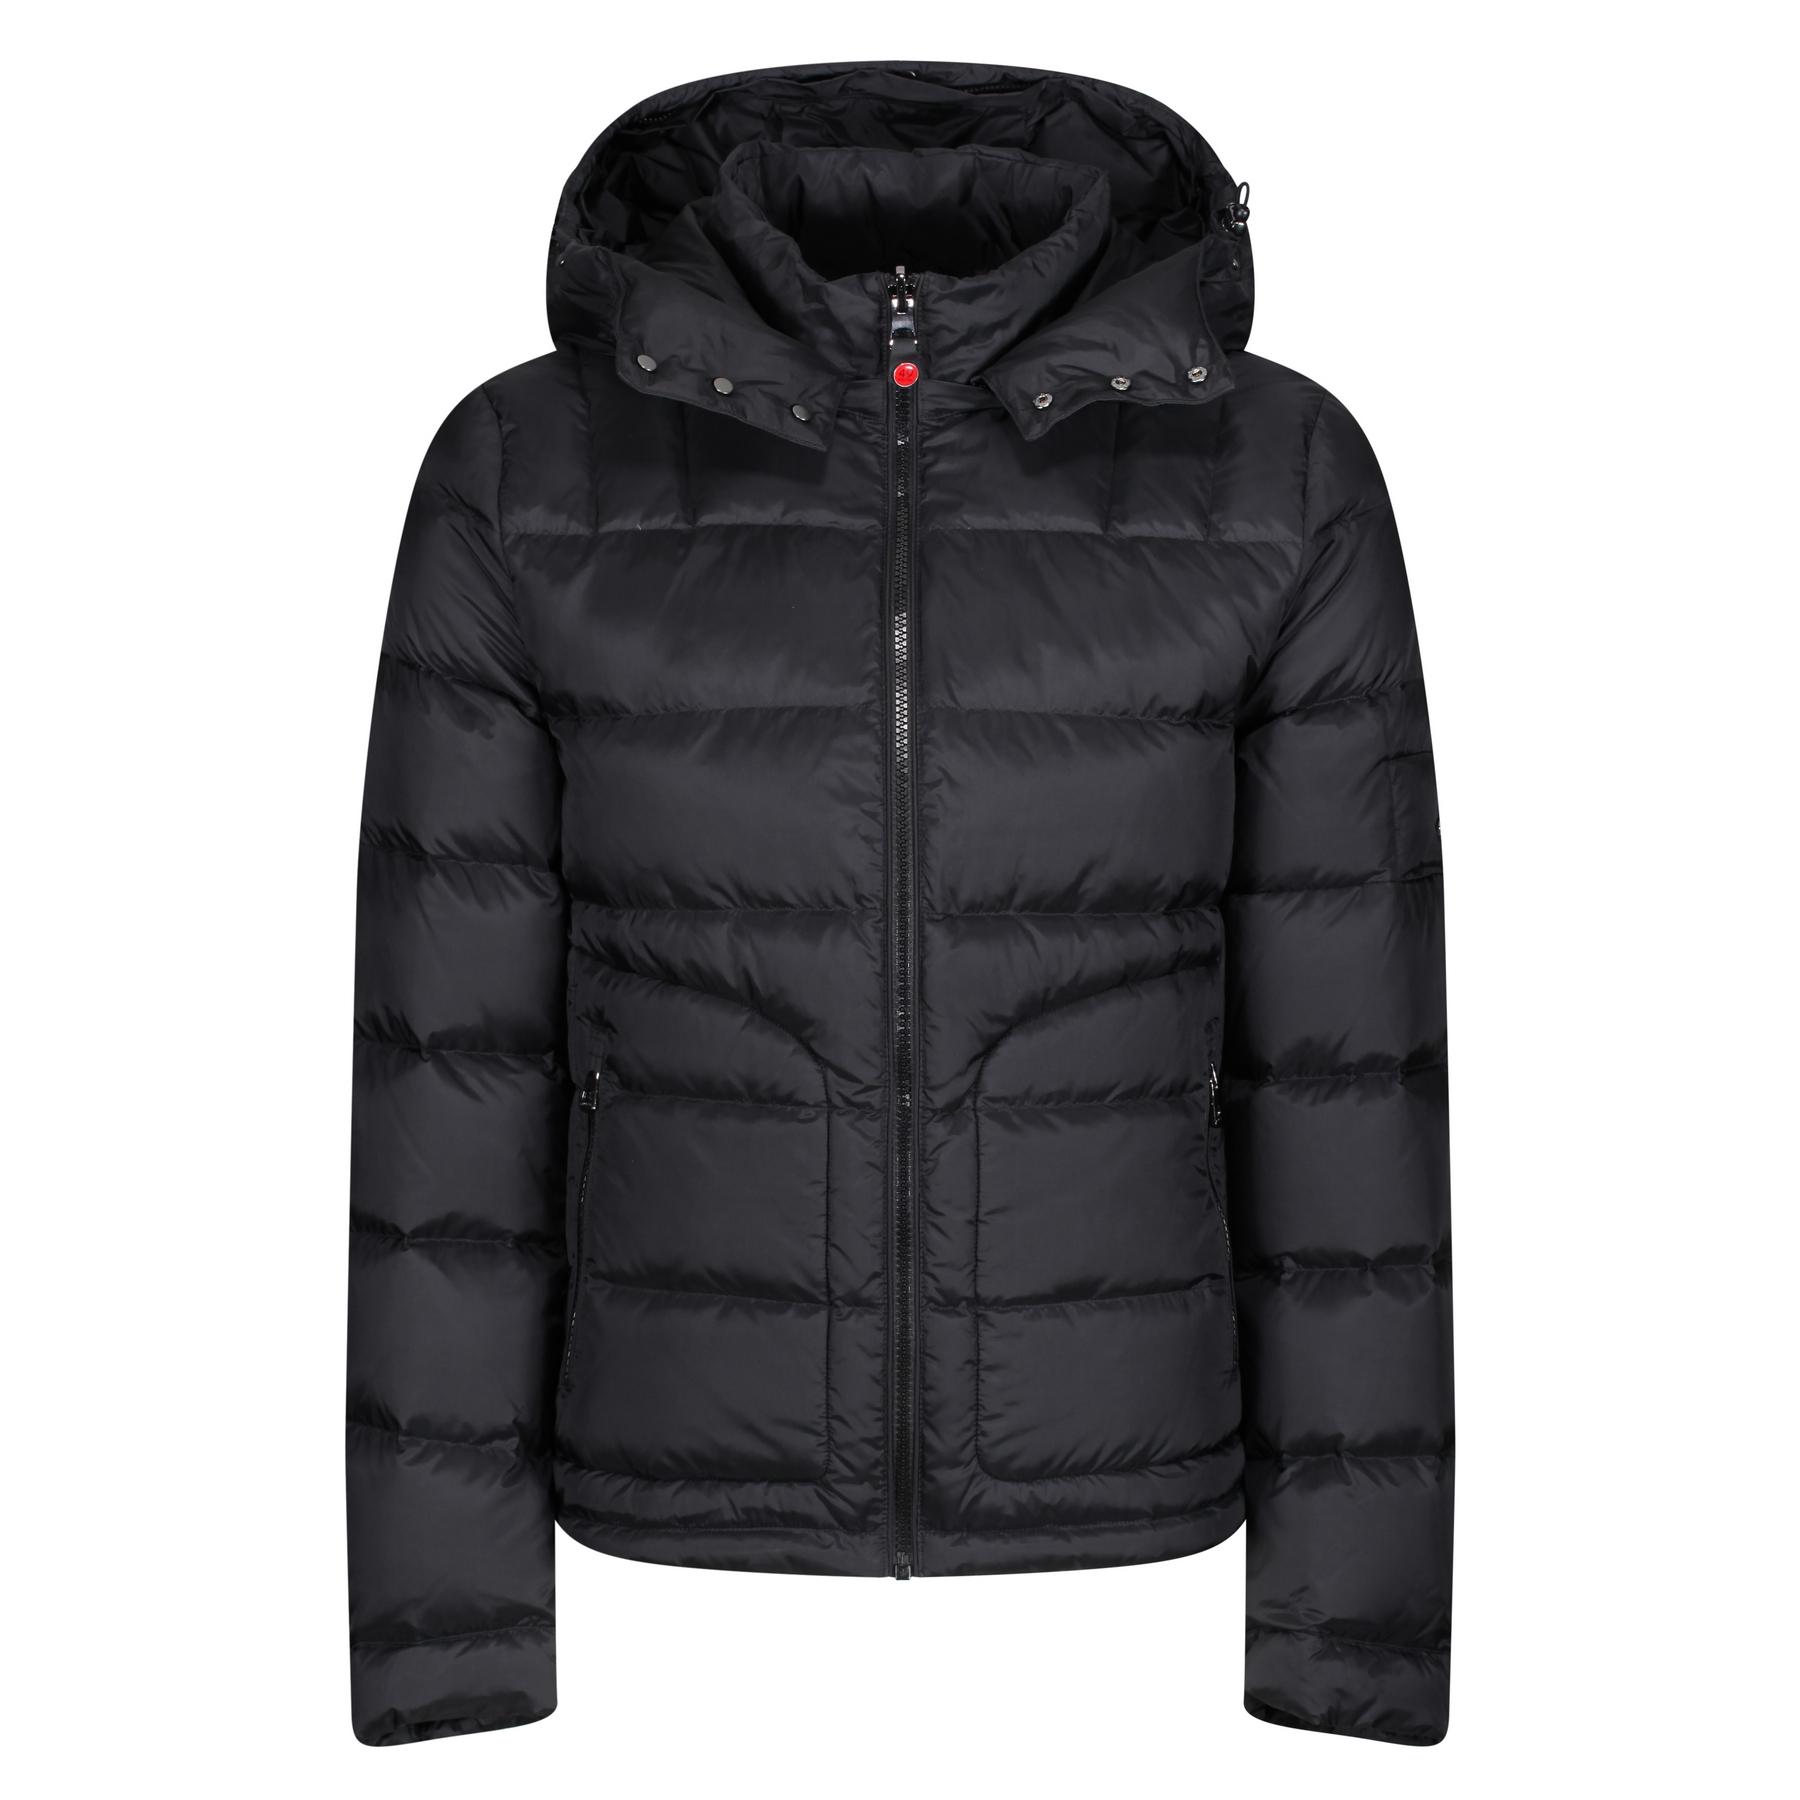 49 Winters The Parka Daunenjacke Fur Black Verkauf bei